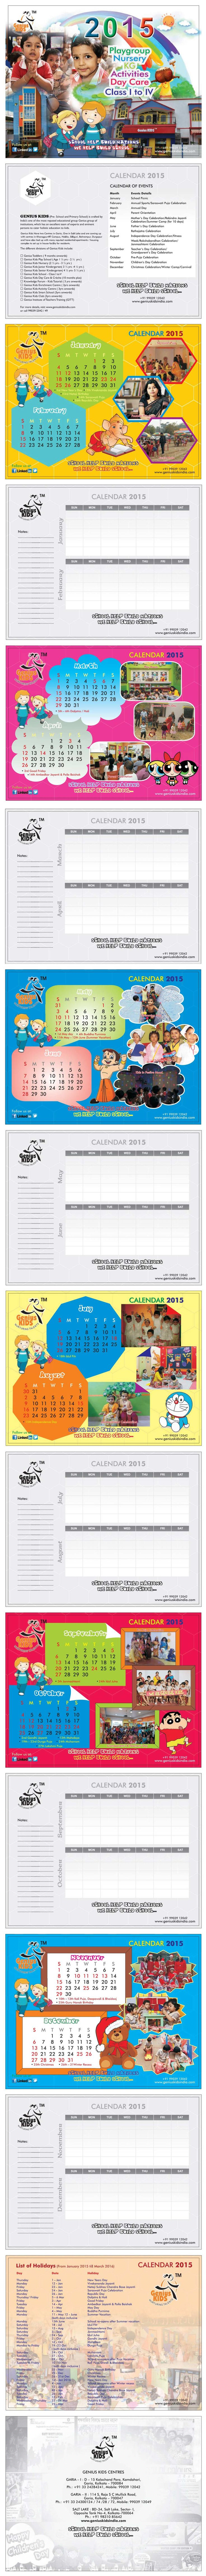 Genius Kids Calendar 2015